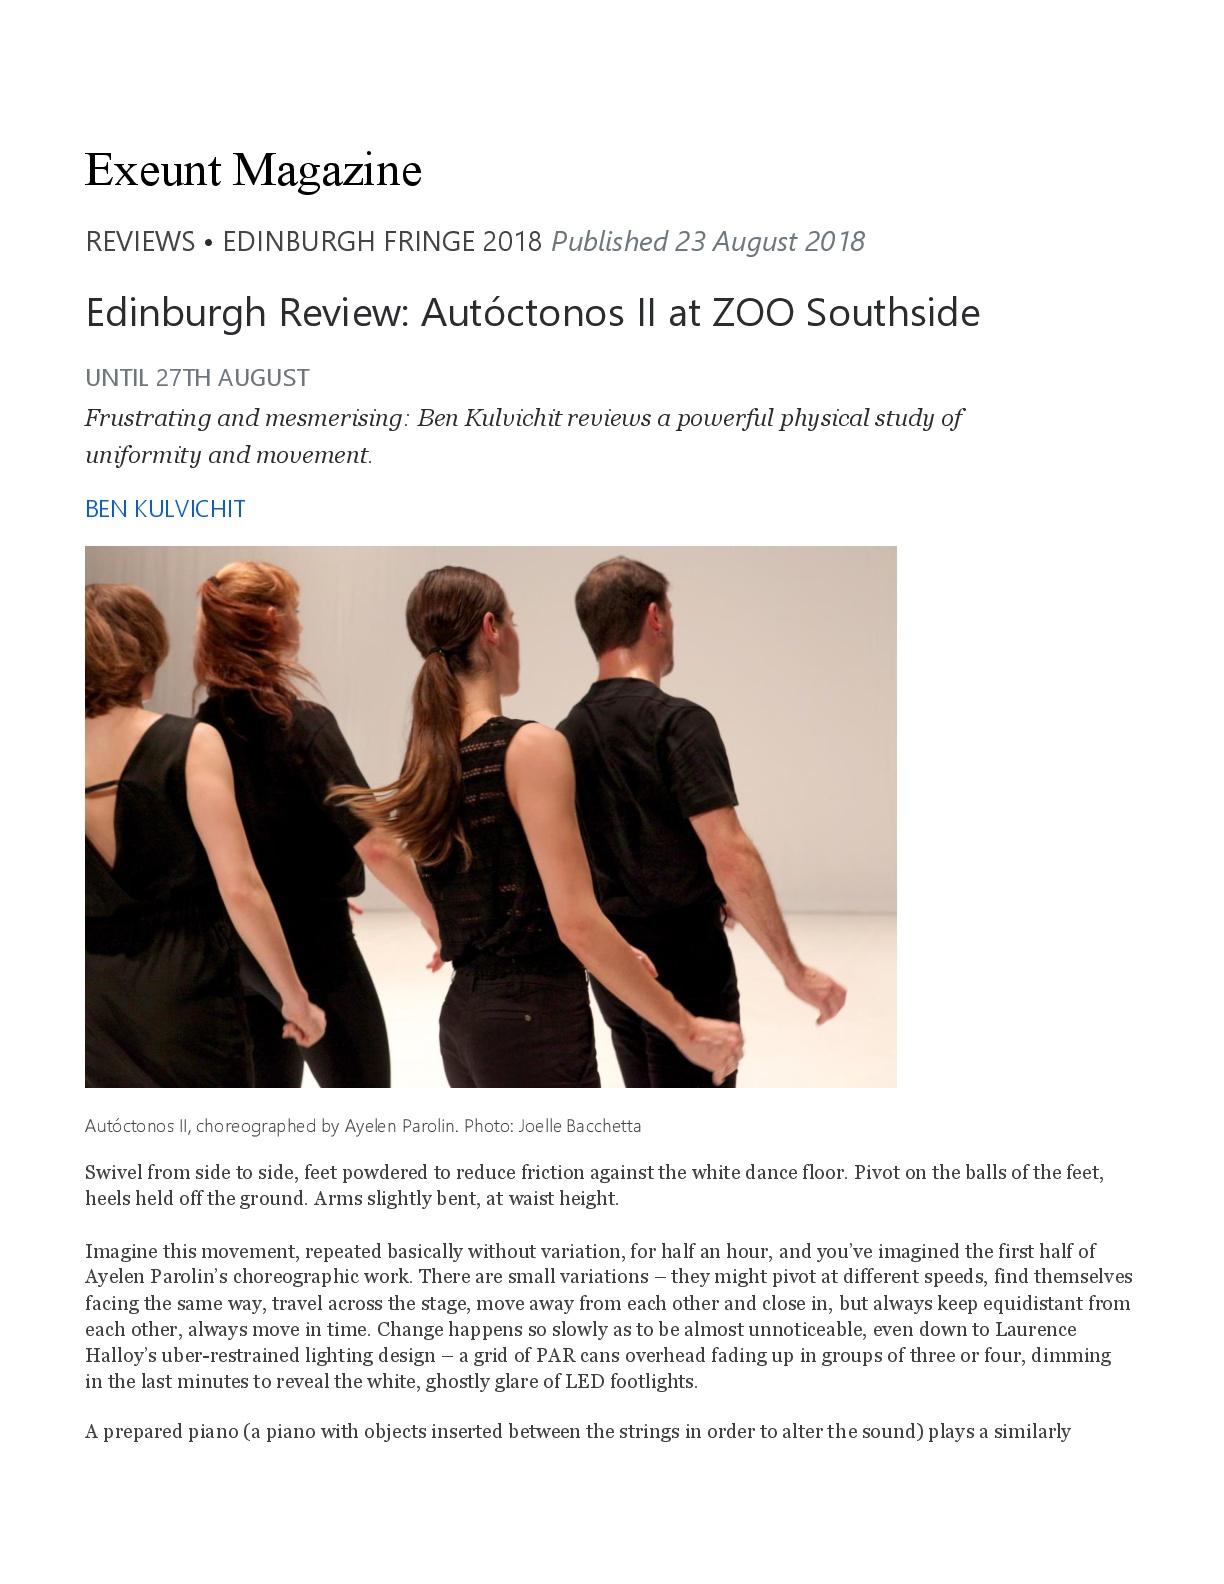 review-Exeunt-Magazine_AUT-II-001.jpg